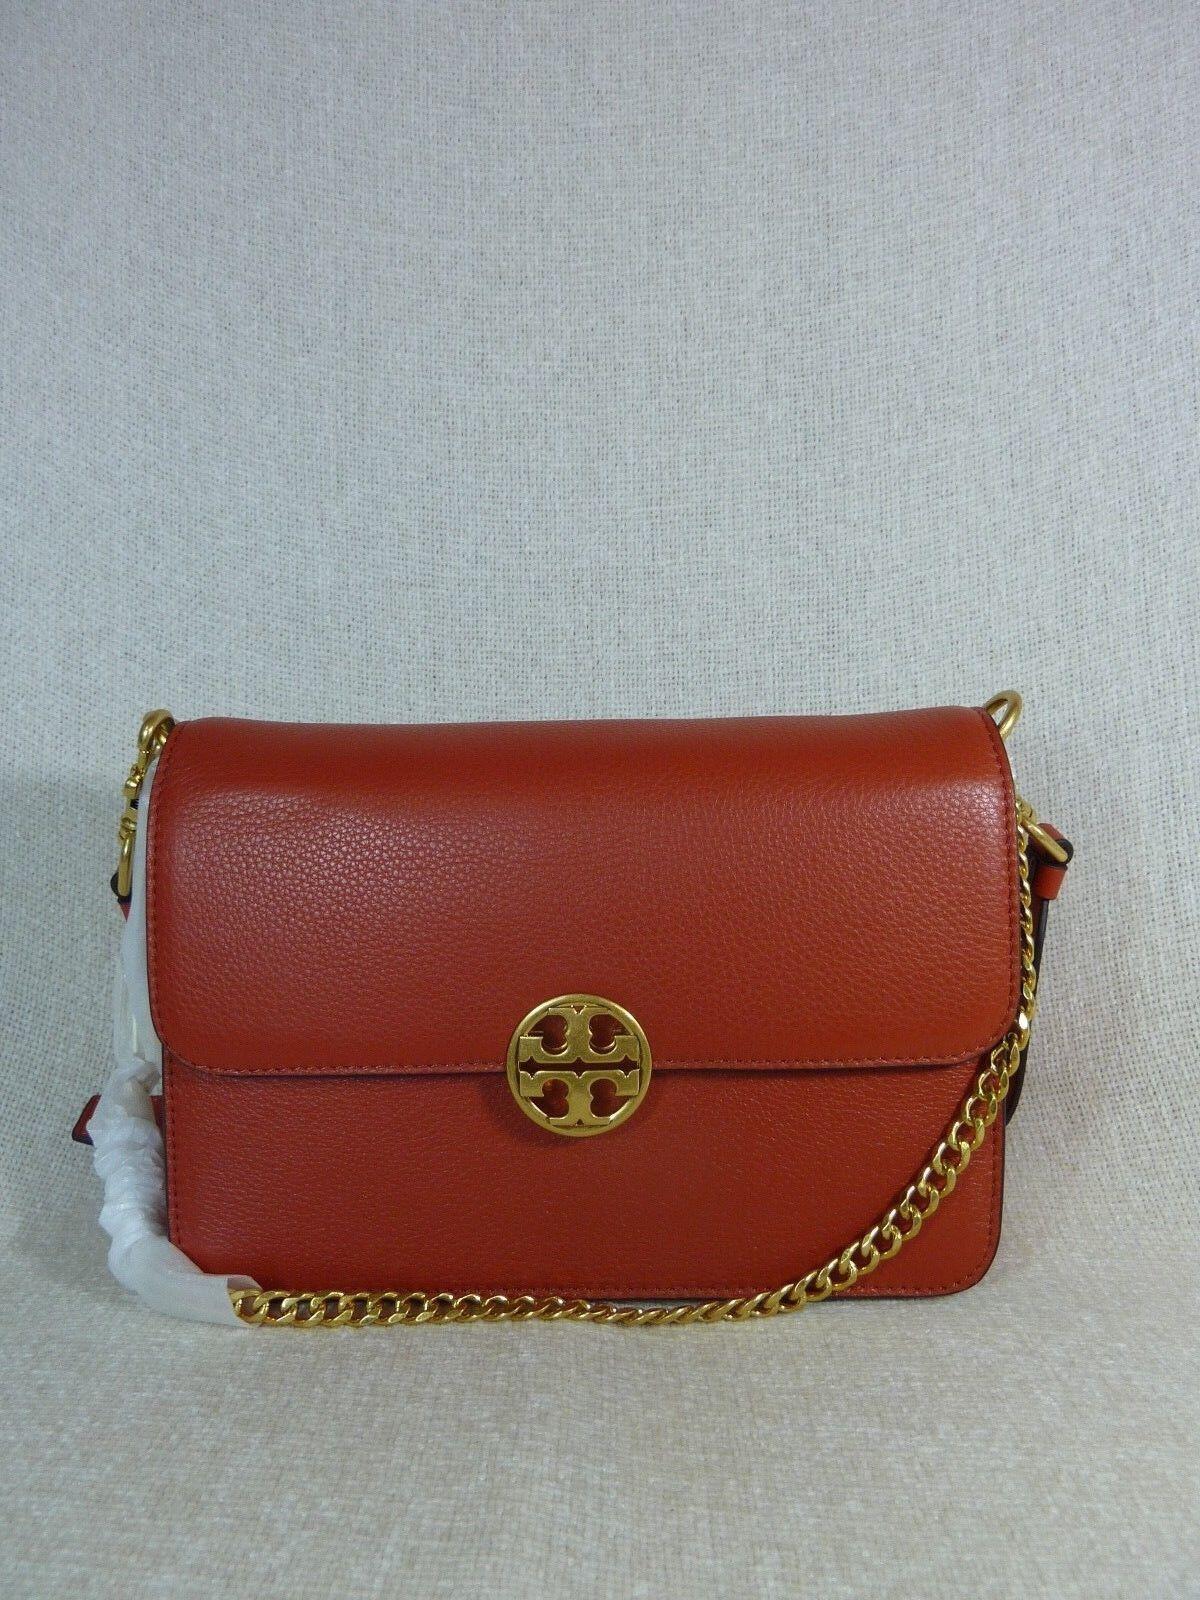 fe522dc40d6c Tory Burch Chelsea Convertible Shoulder Bag Kola 48735 for sale online